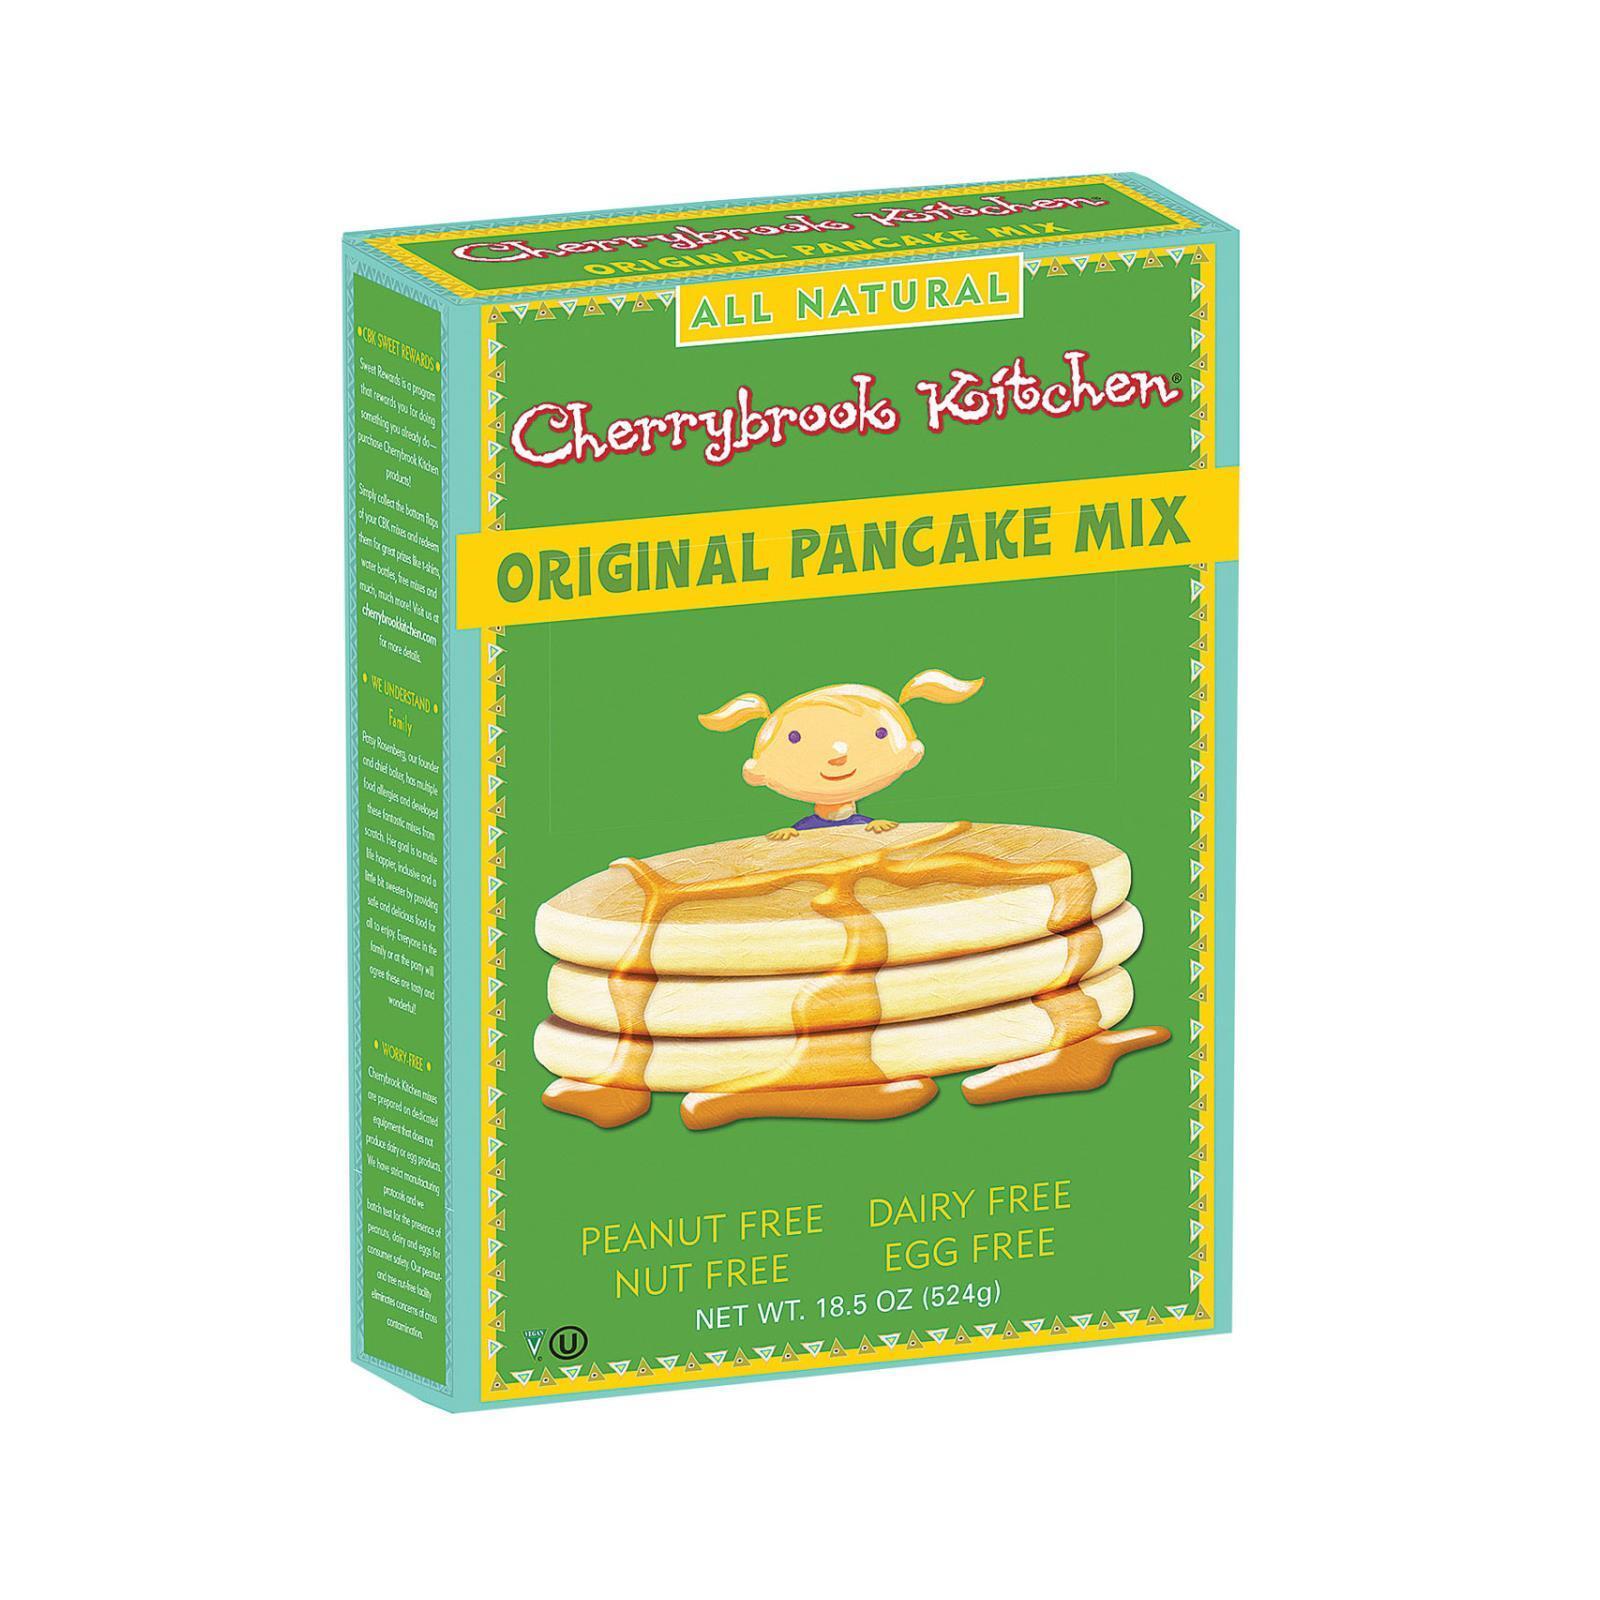 Cherrybrook Kitchen Pancake Mix - Original - Case of 6 - 18.5 oz